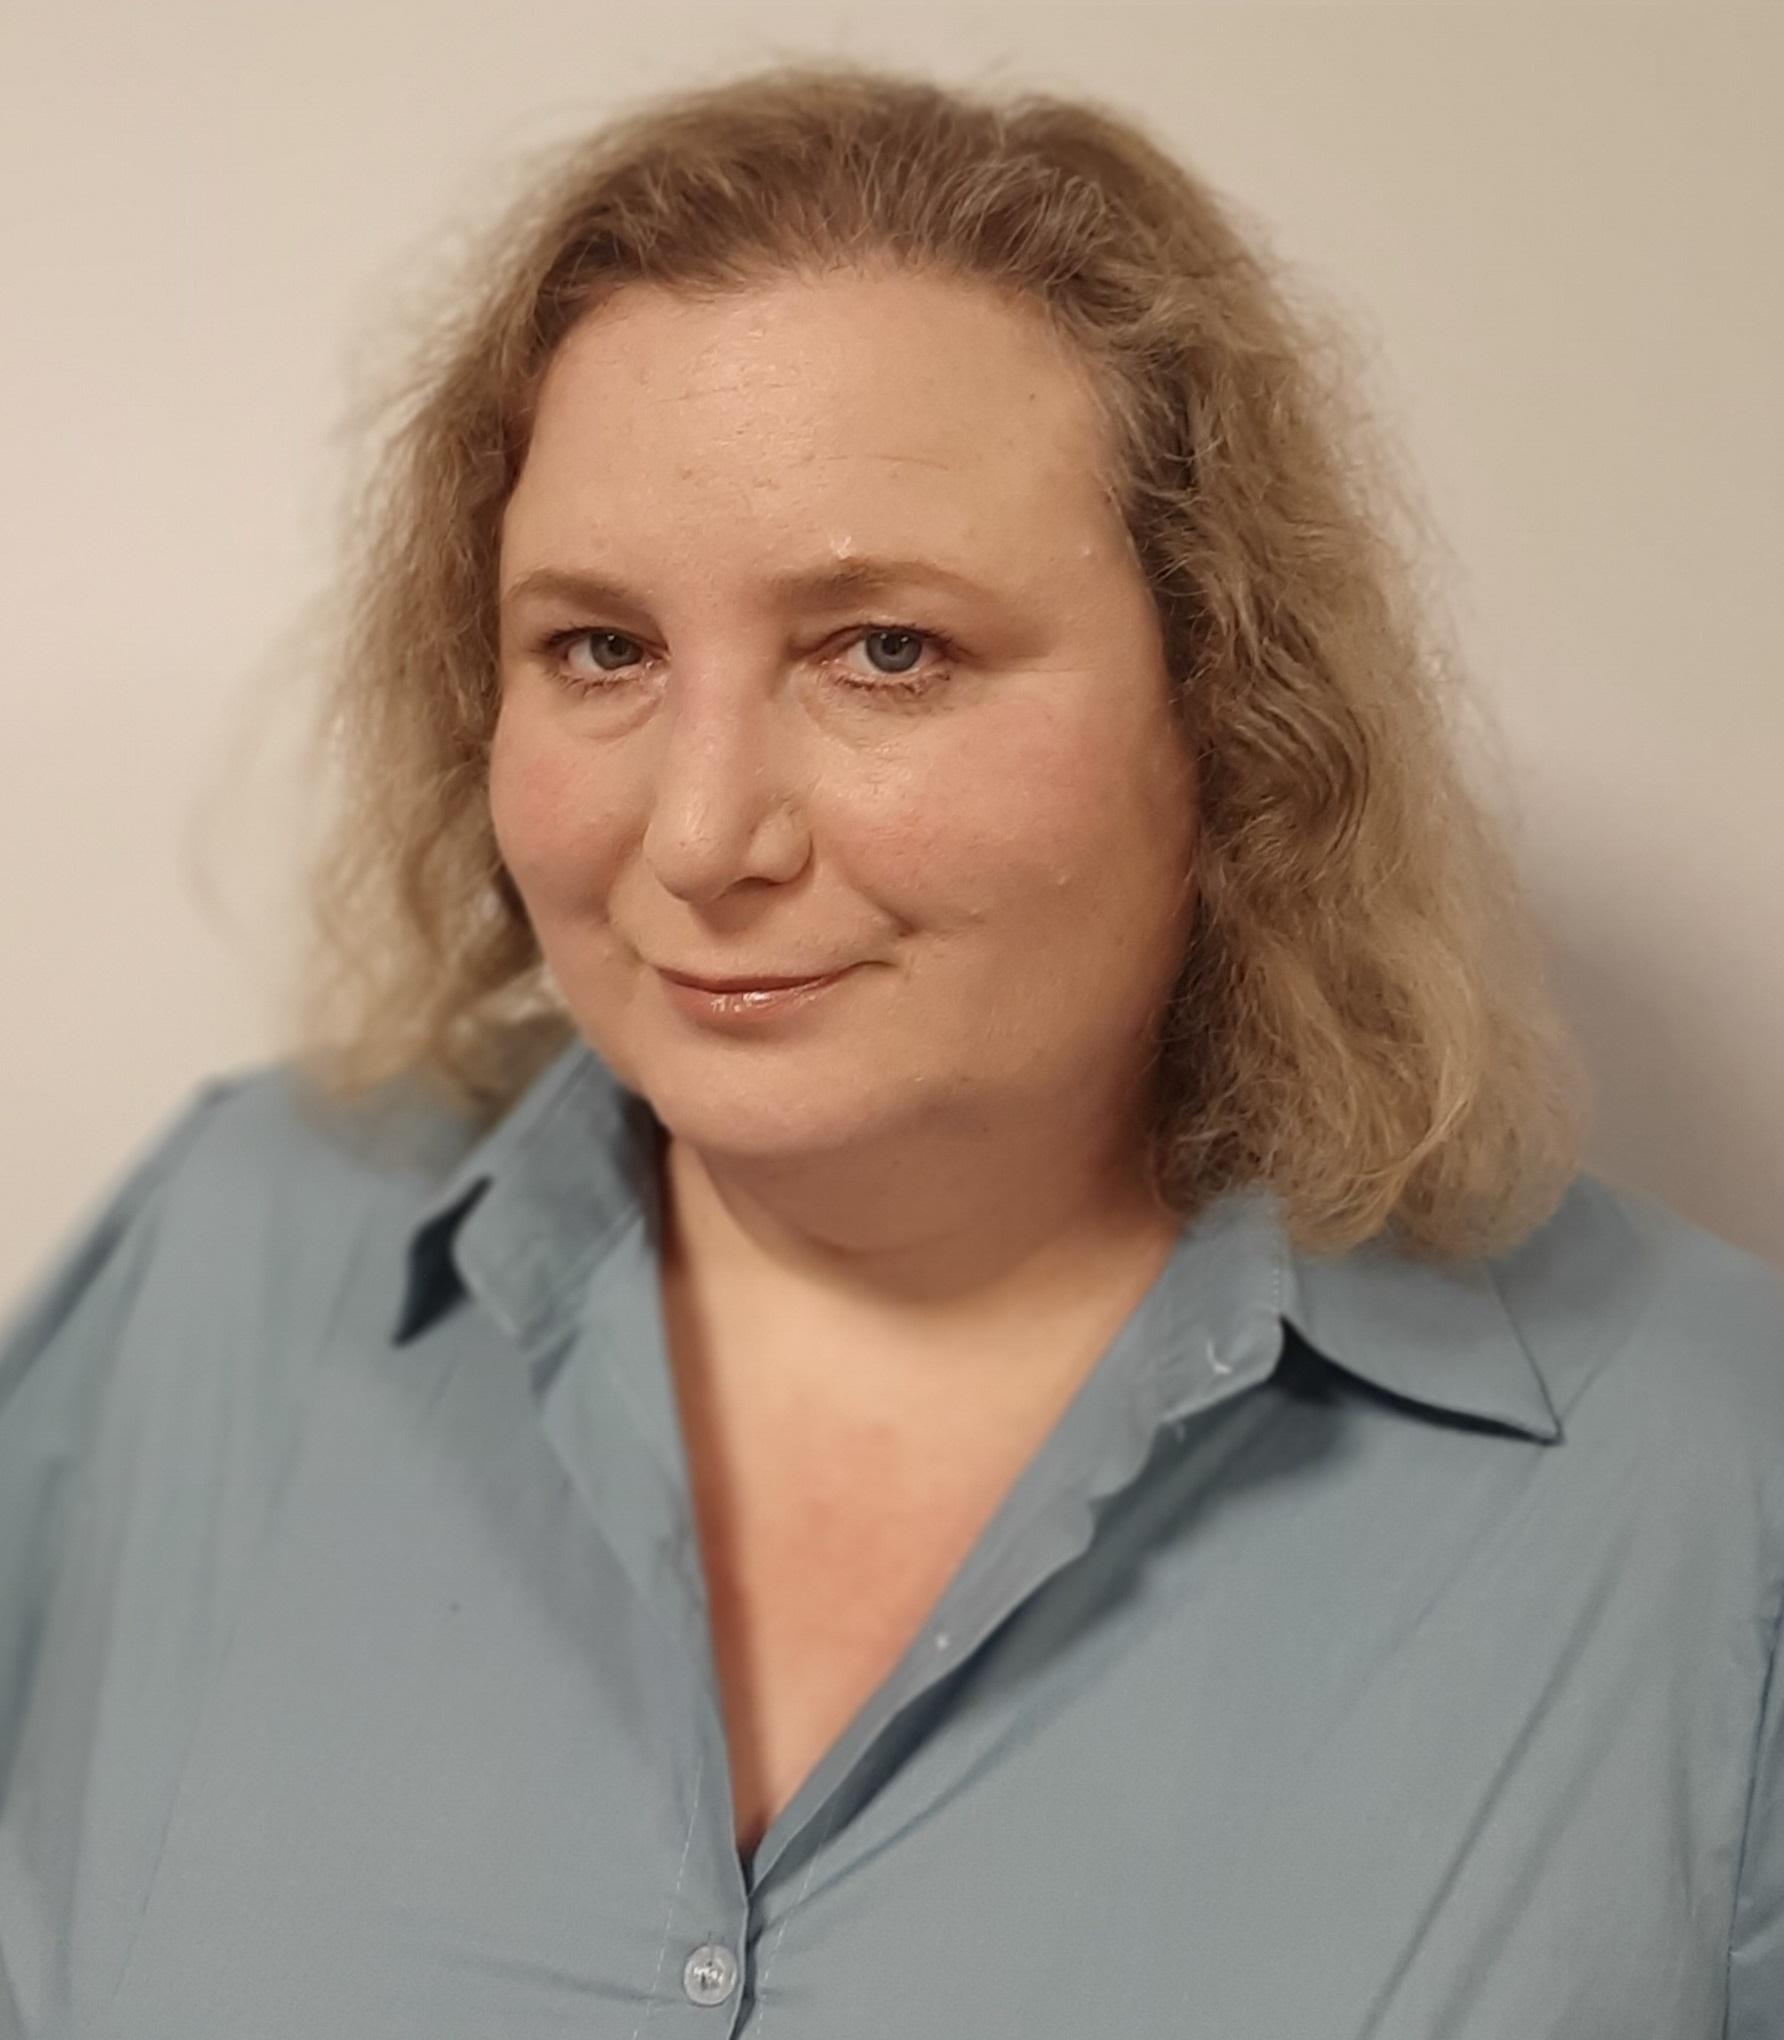 Galina Branopolsky - QA Director